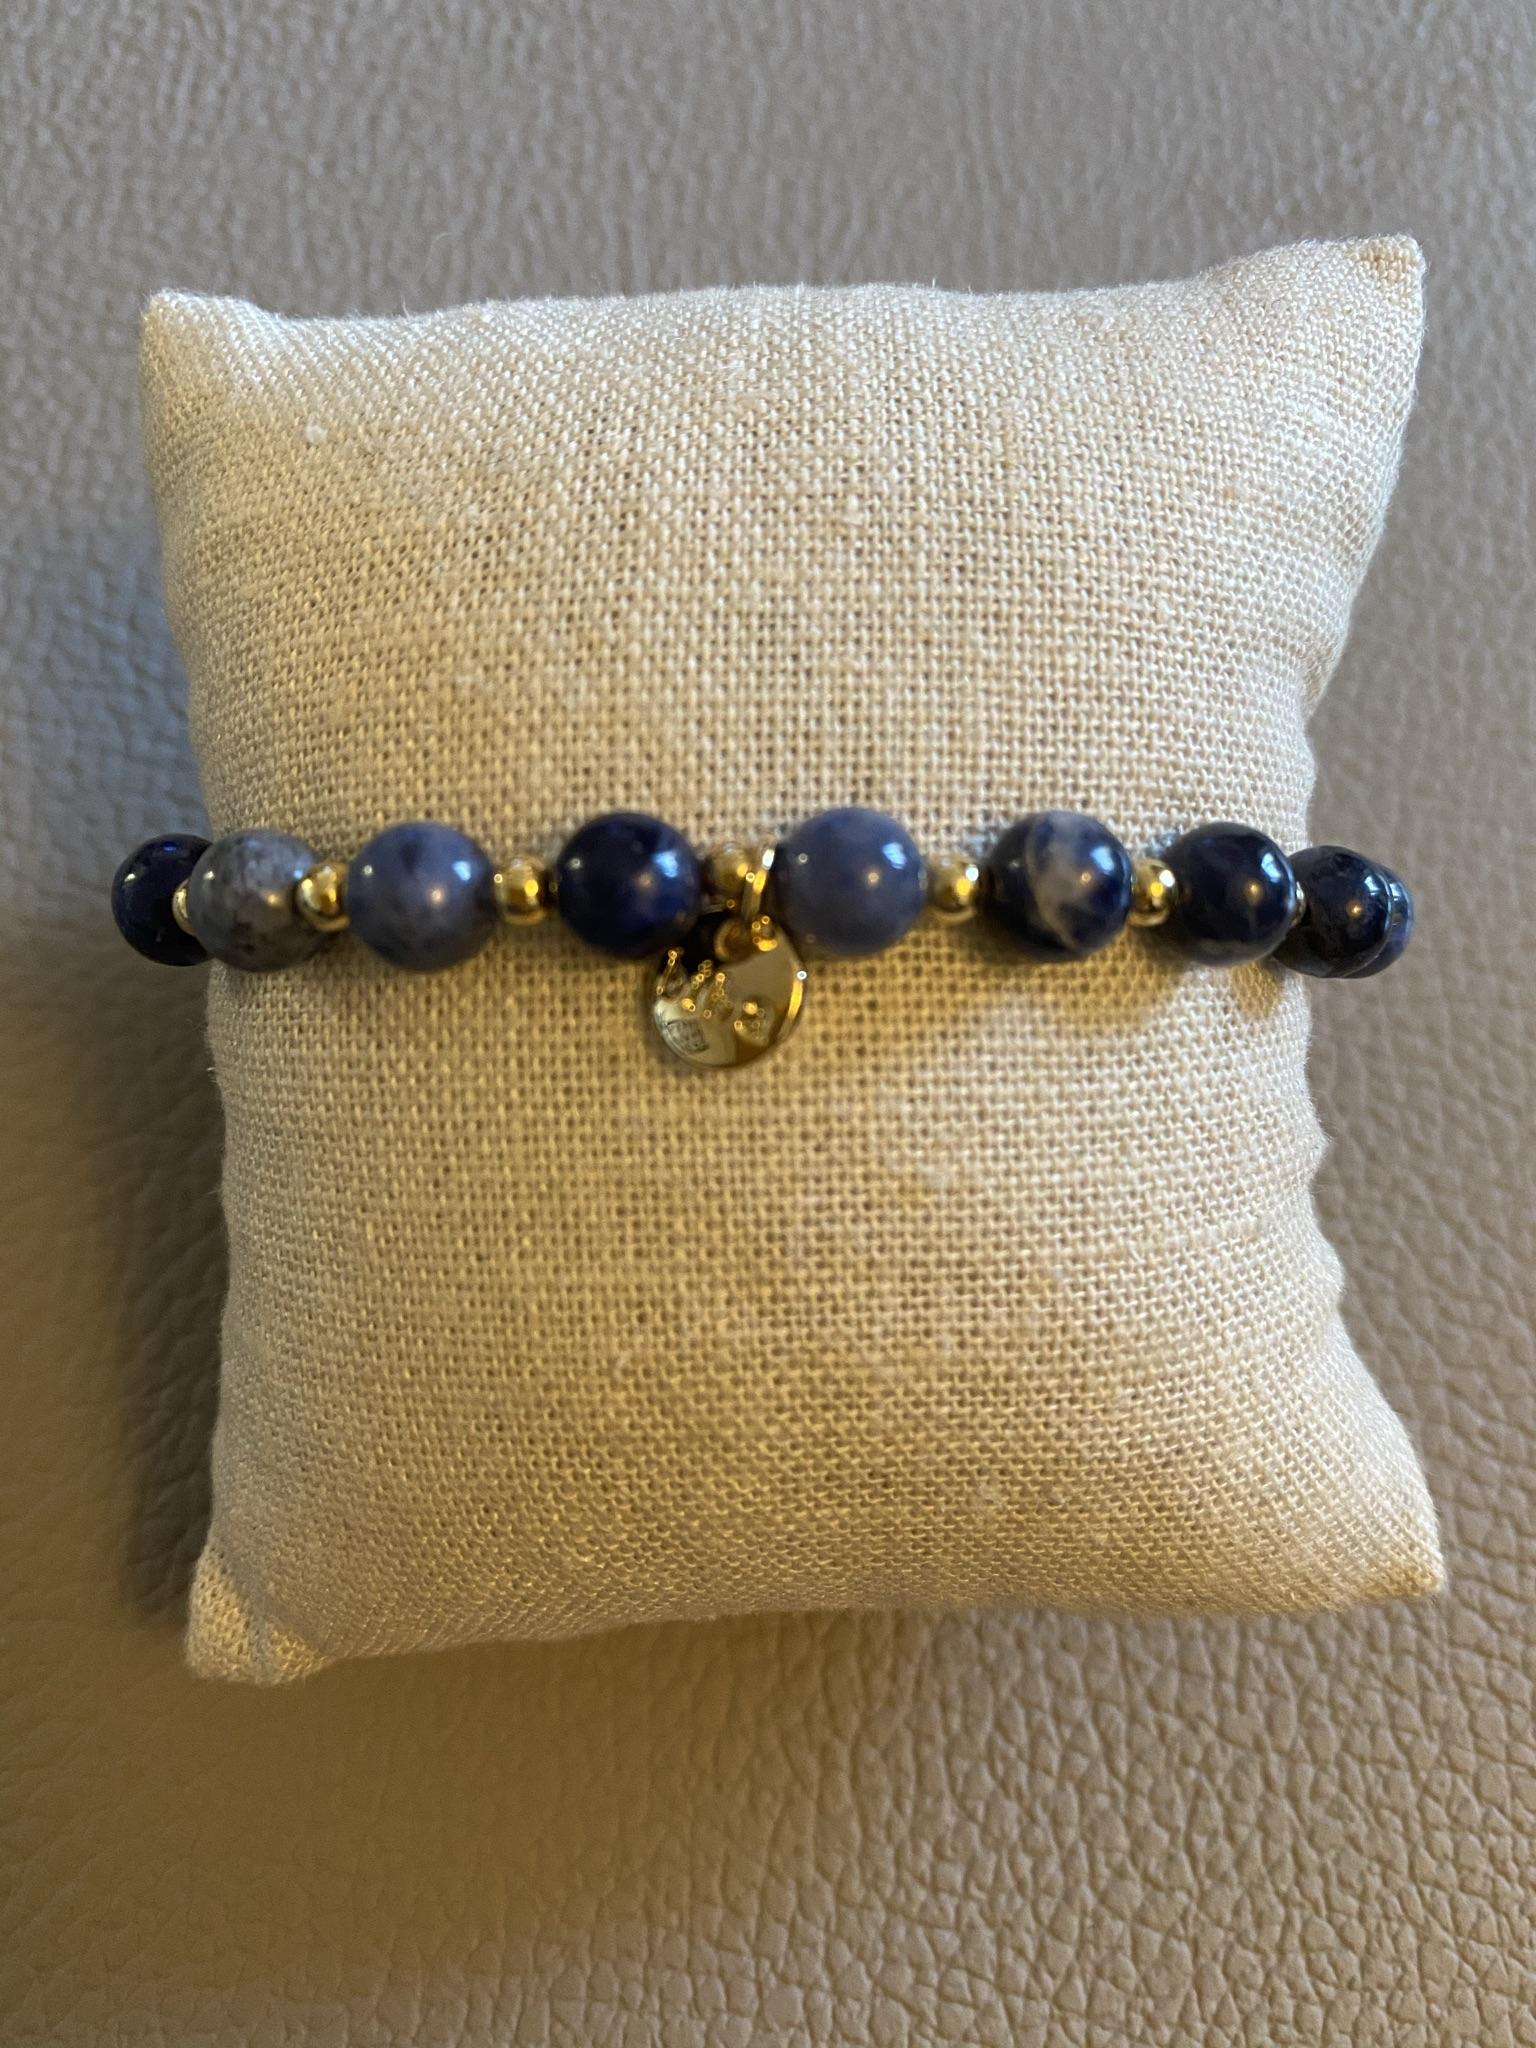 Biba Armband blau marmoriert gold